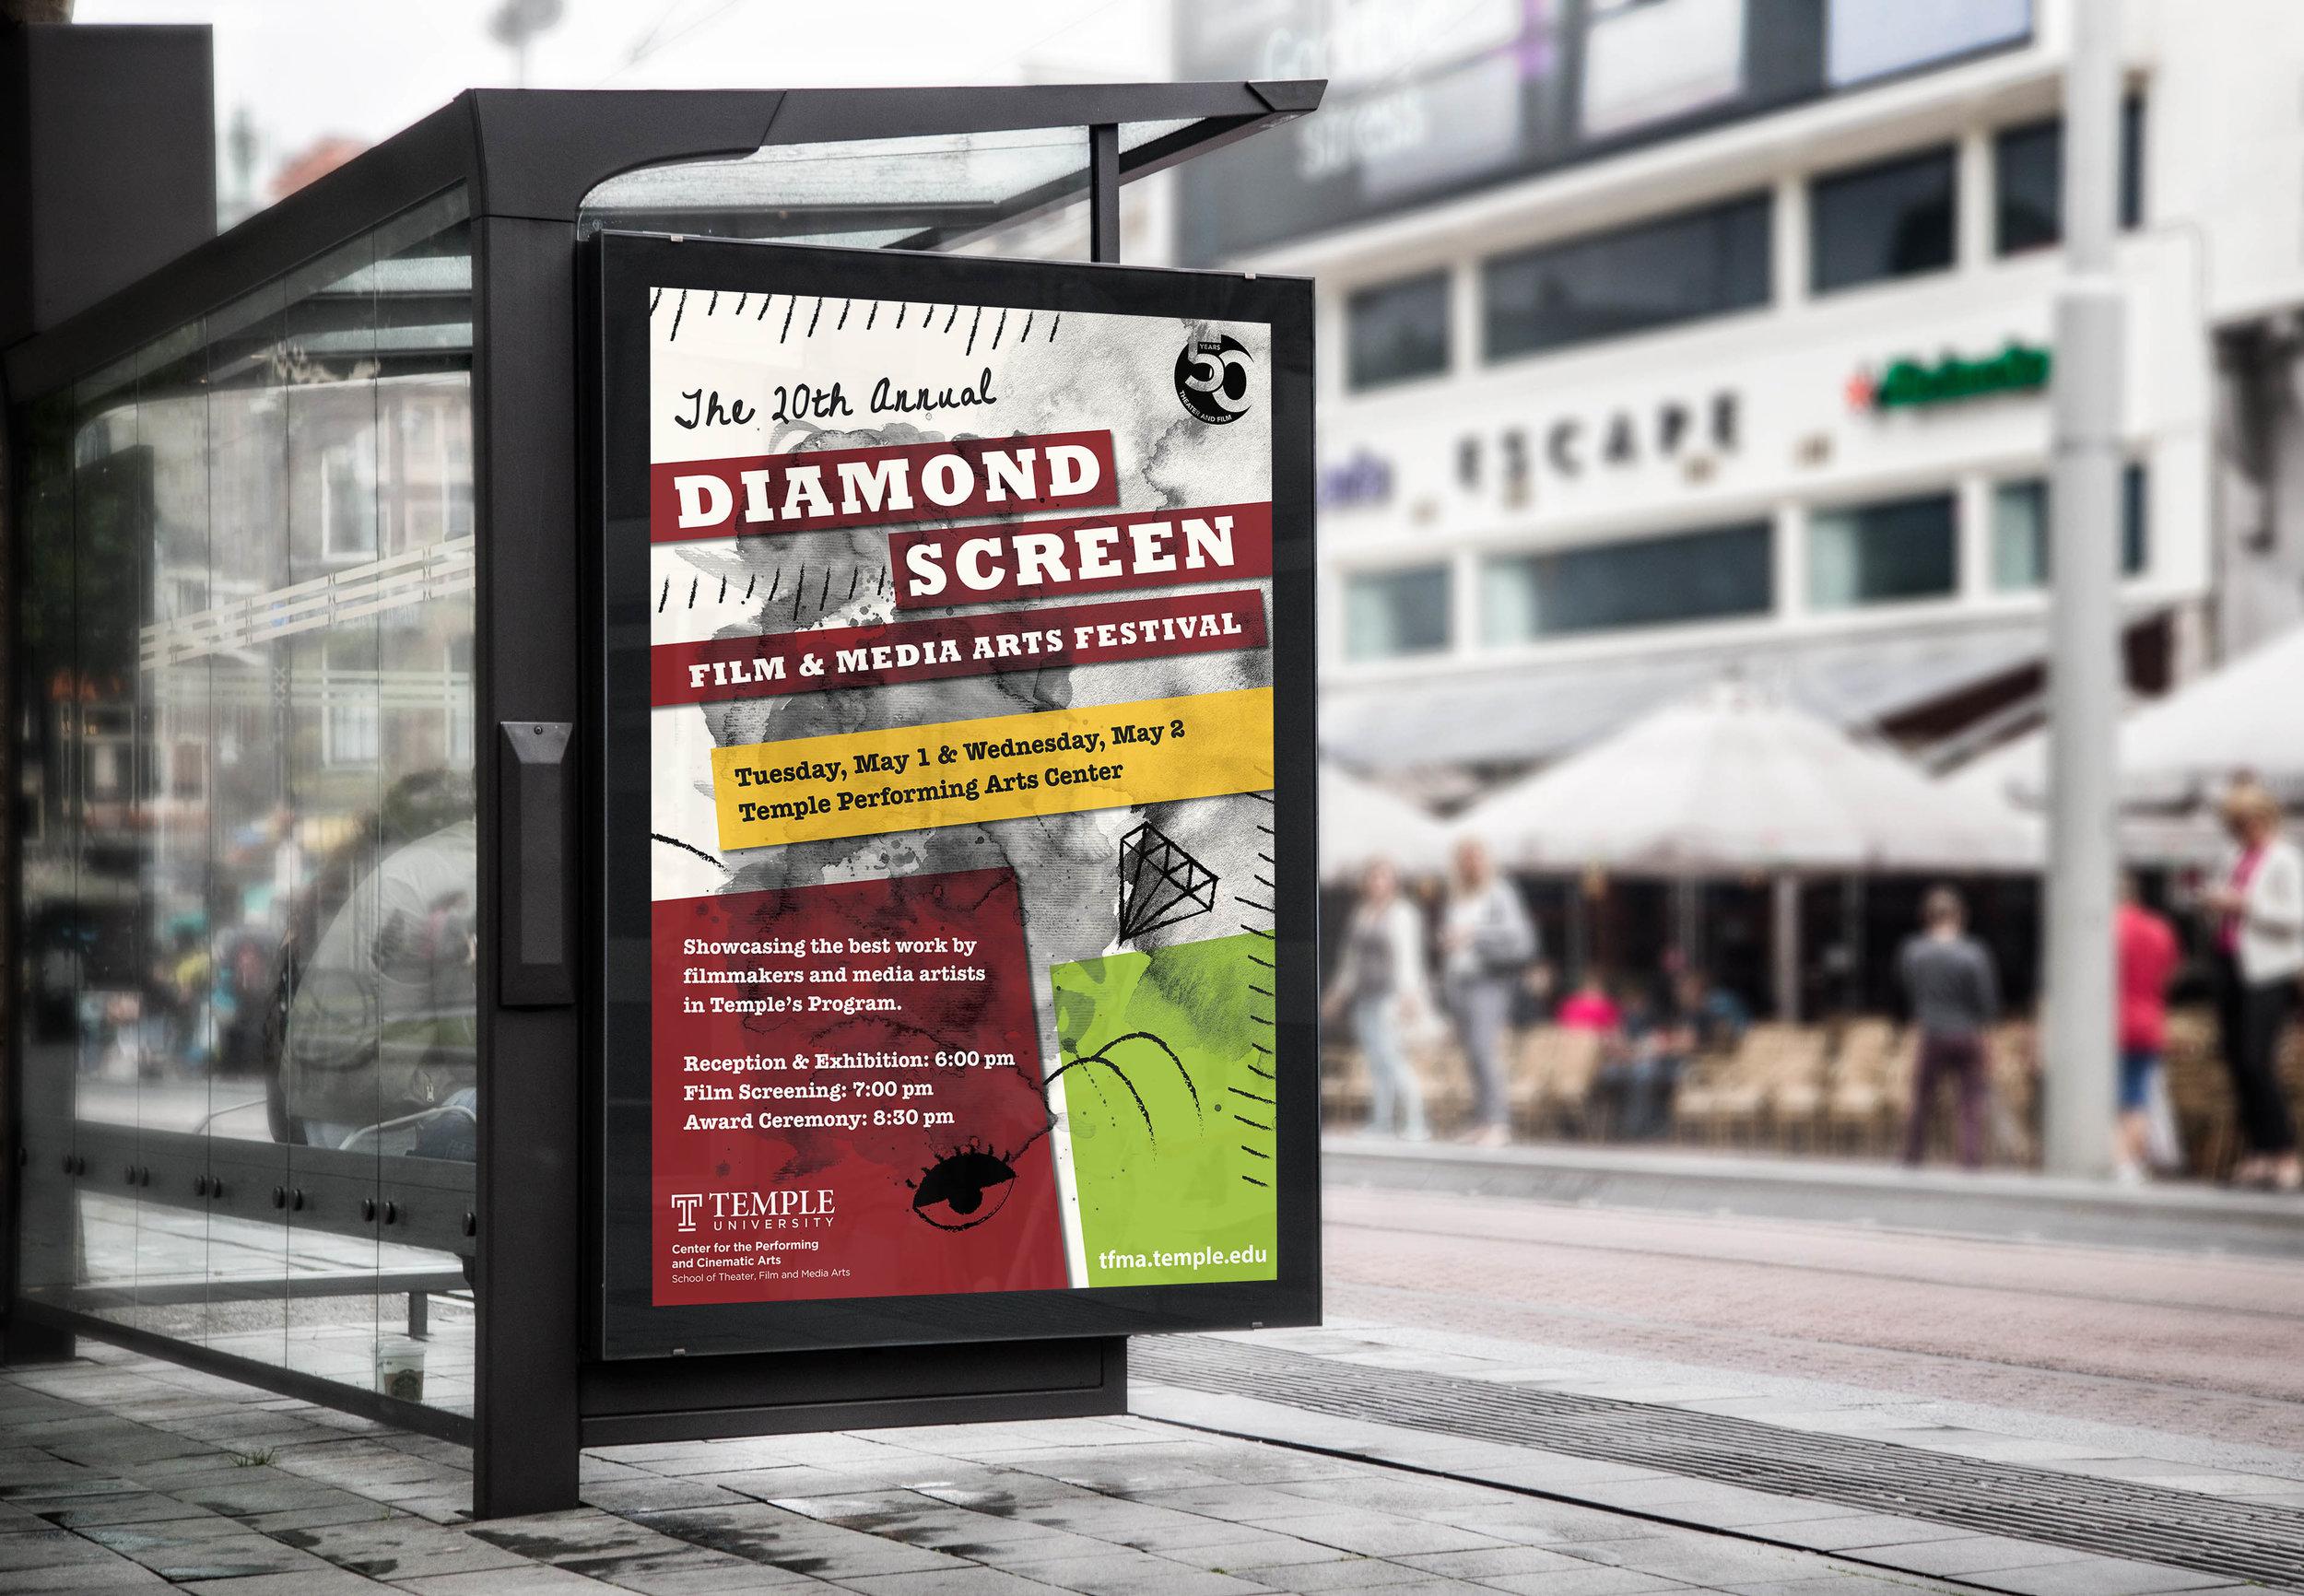 BillboardMockUp_DSFS.jpg